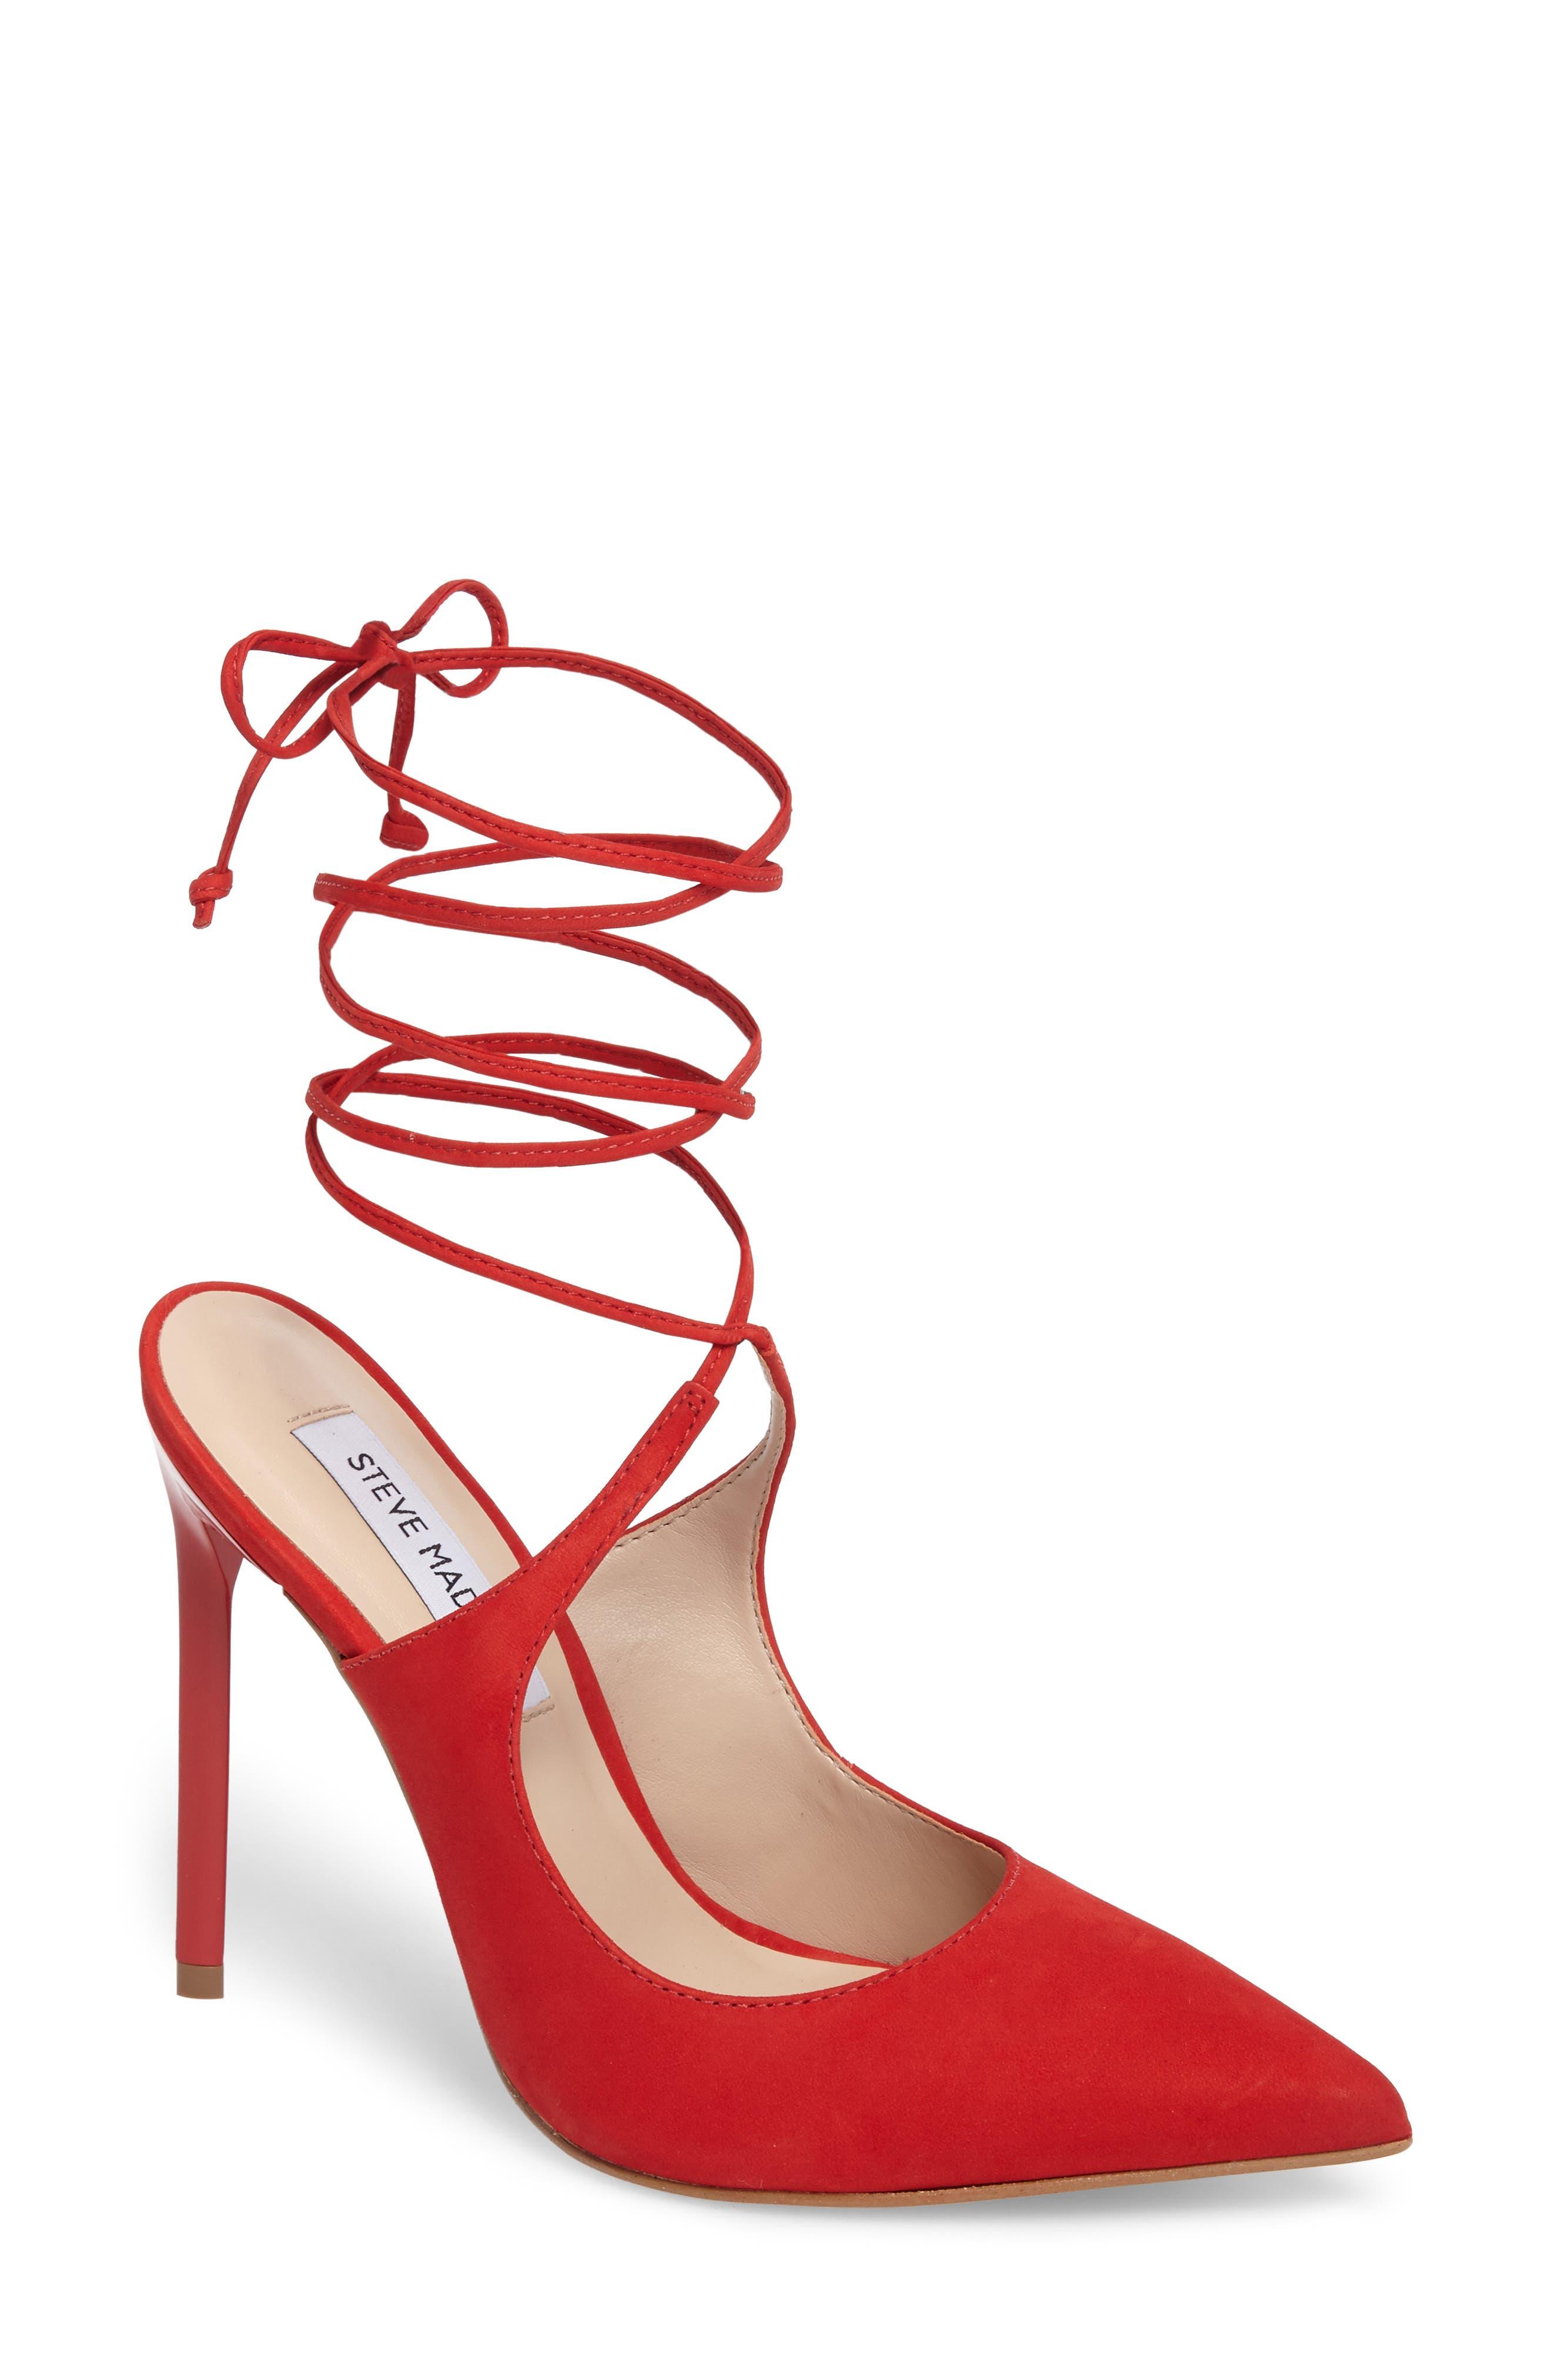 Raven Ankle Wrap Pump,                             Main thumbnail 1, color,                             Red Nubuck Leather